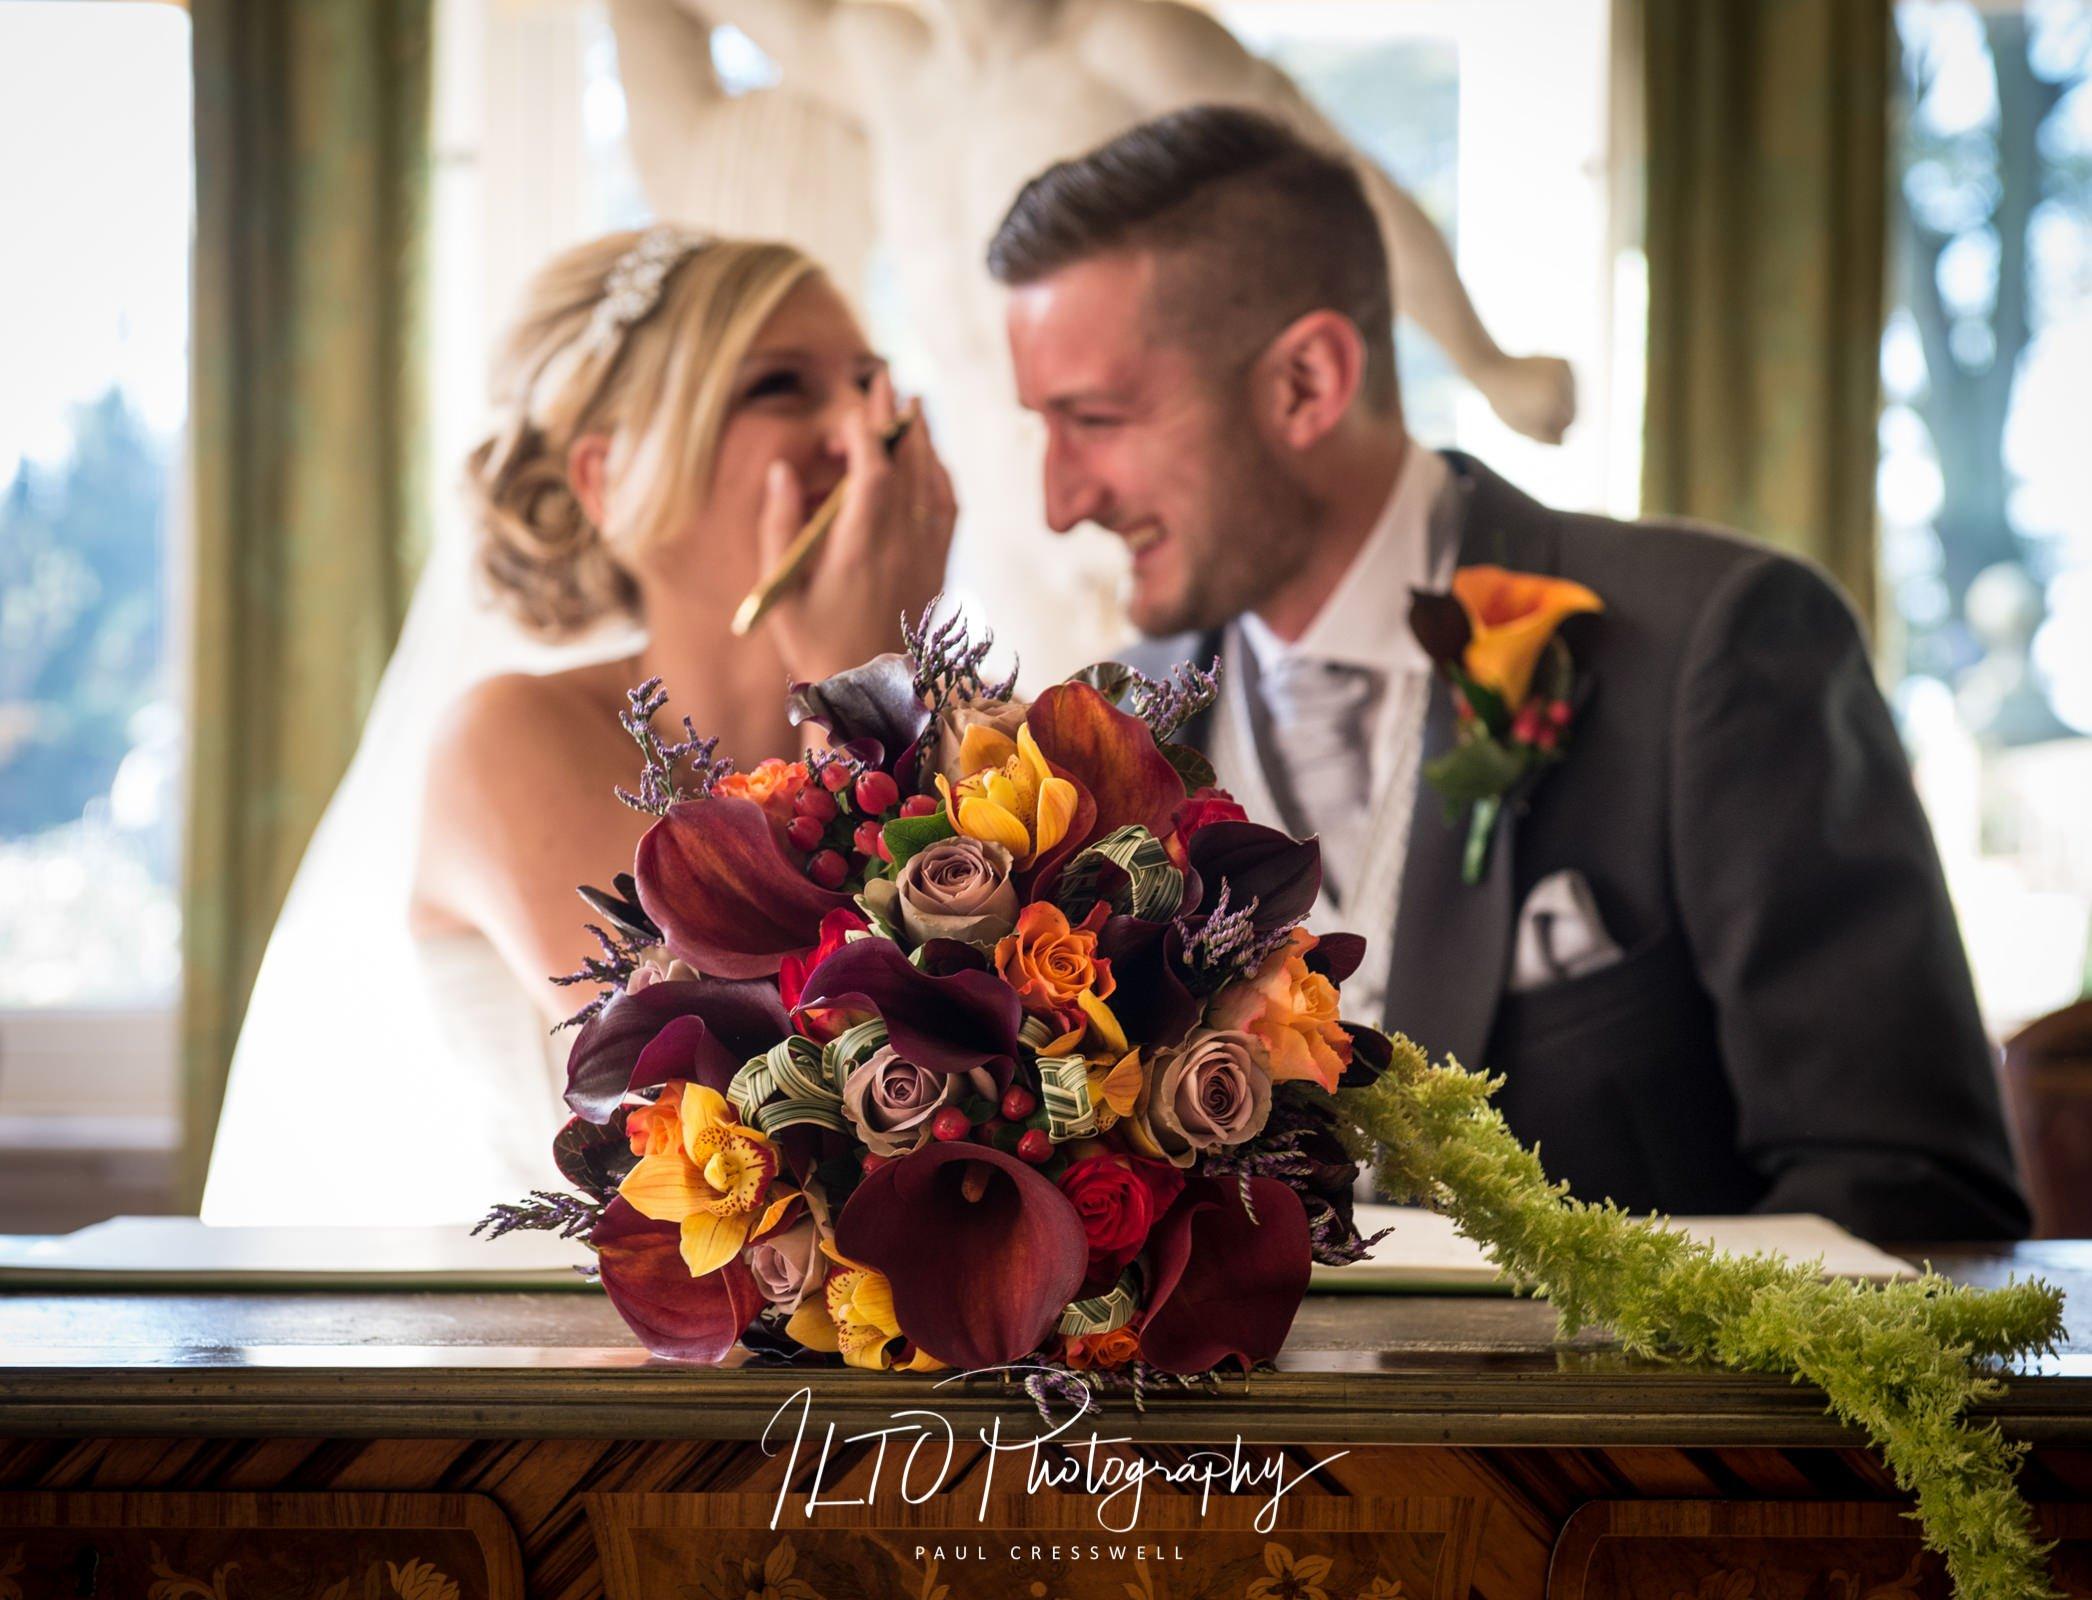 Wakefield photographer funny wedding photo